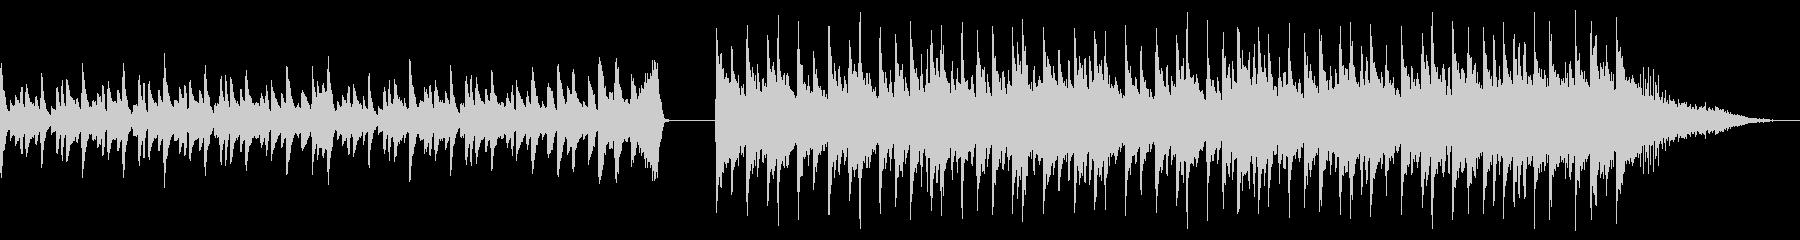 90s劇伴風BGMの未再生の波形